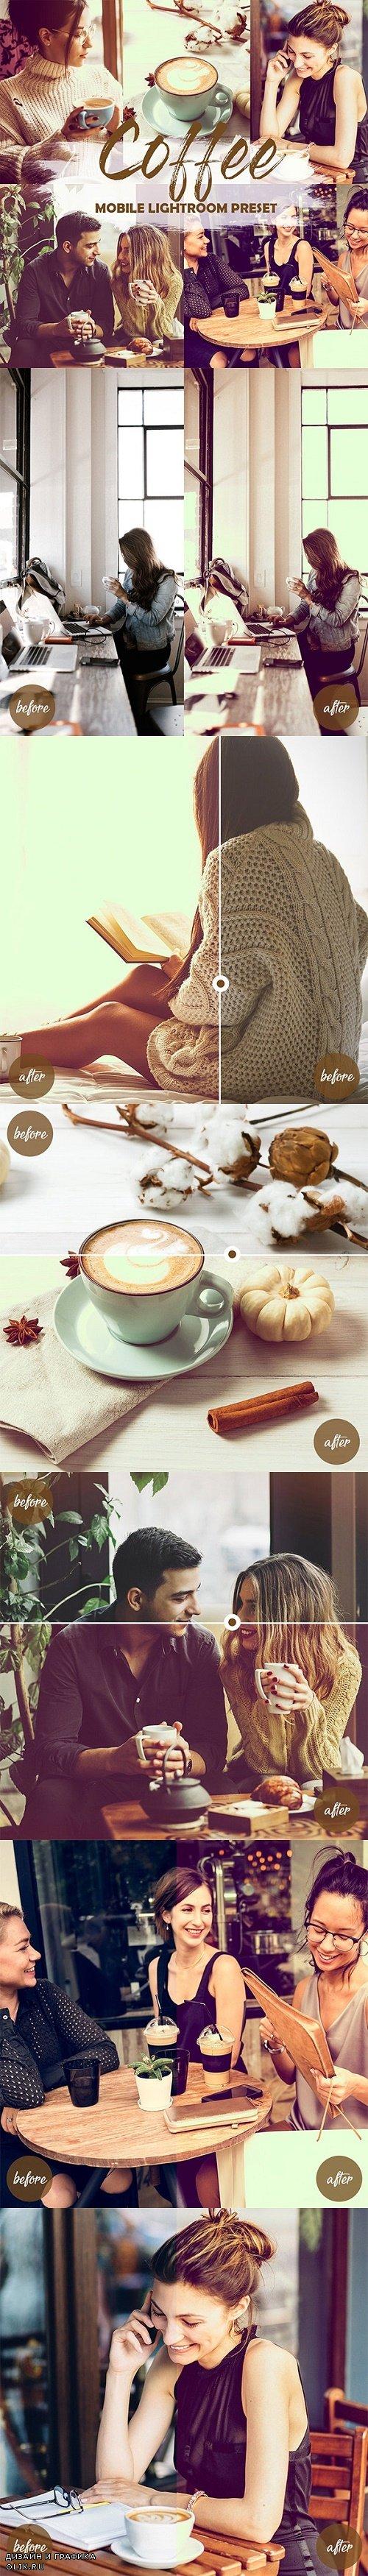 Lightroom Preset Mobile Coffee Instagram - 23234858